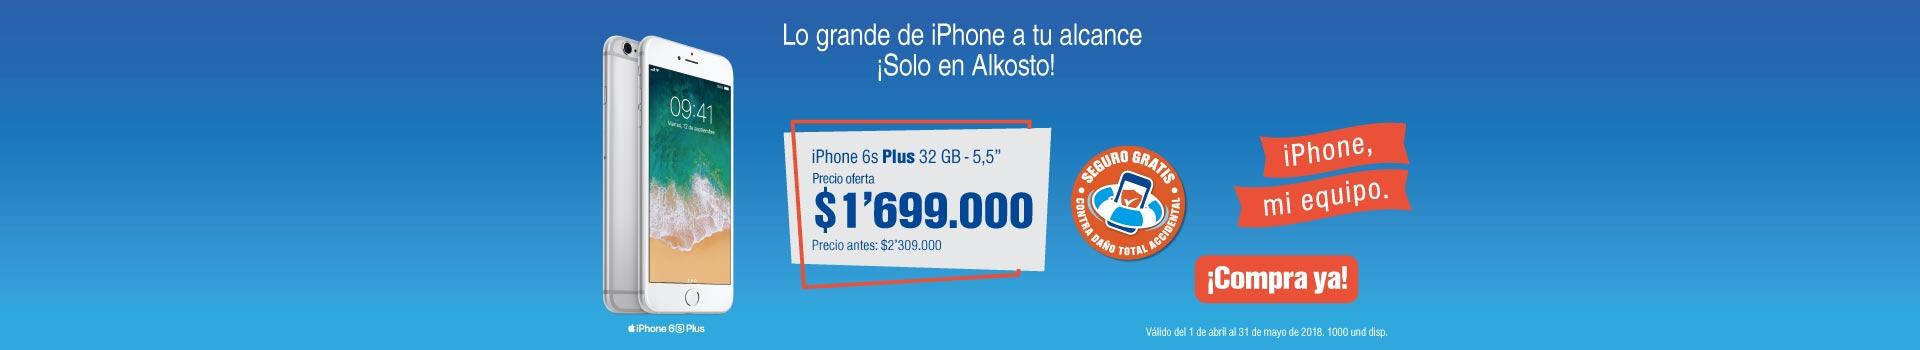 HIPER AK KT -5-celulares-iPhone6sPlus-cat-abril-5-mayo-31